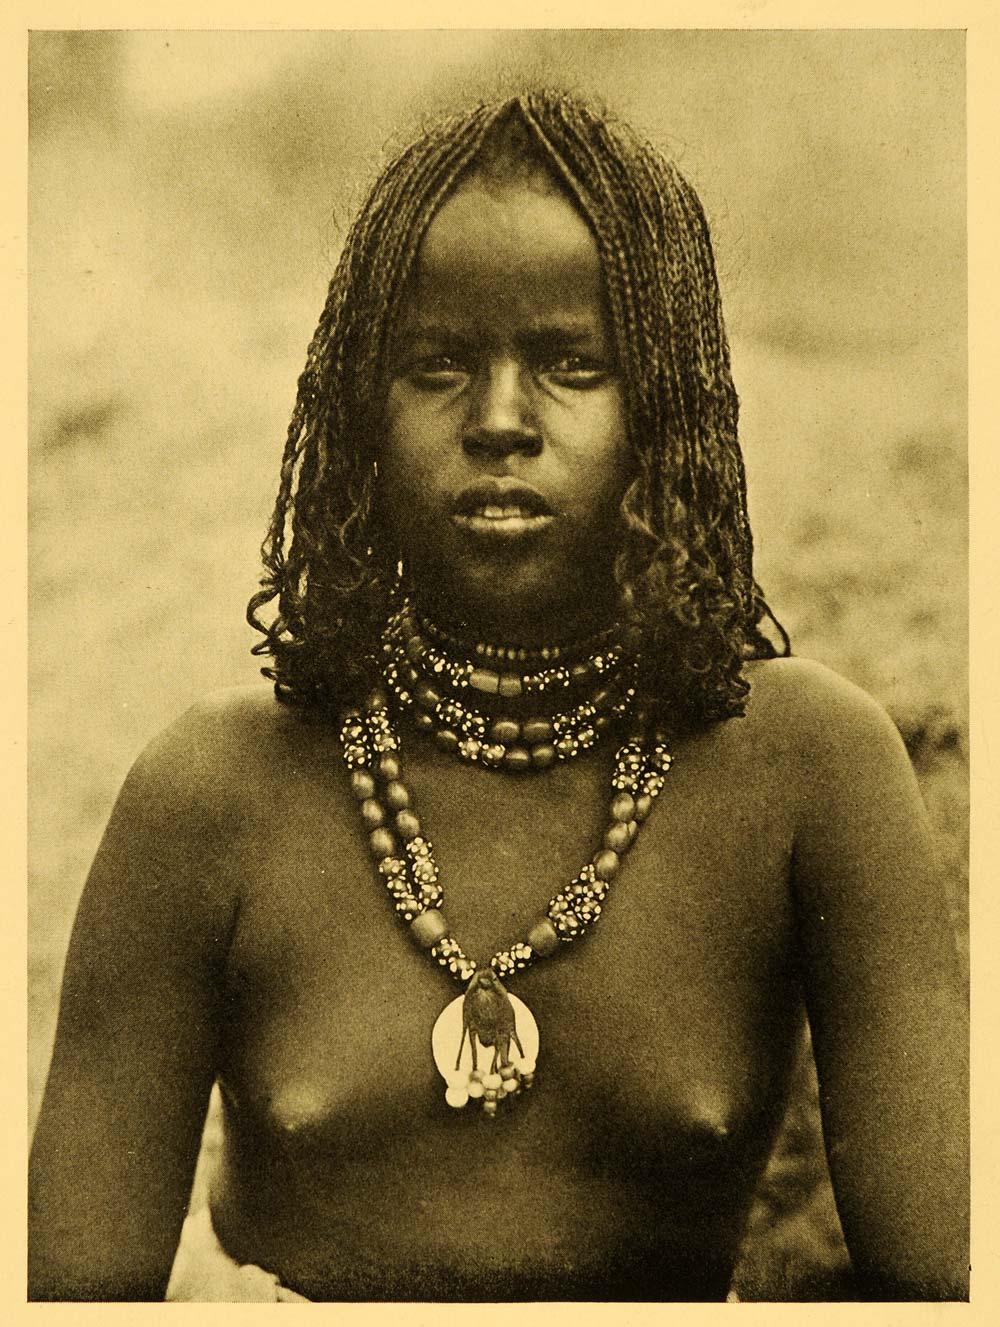 Amusing nude somali women photo apologise, but